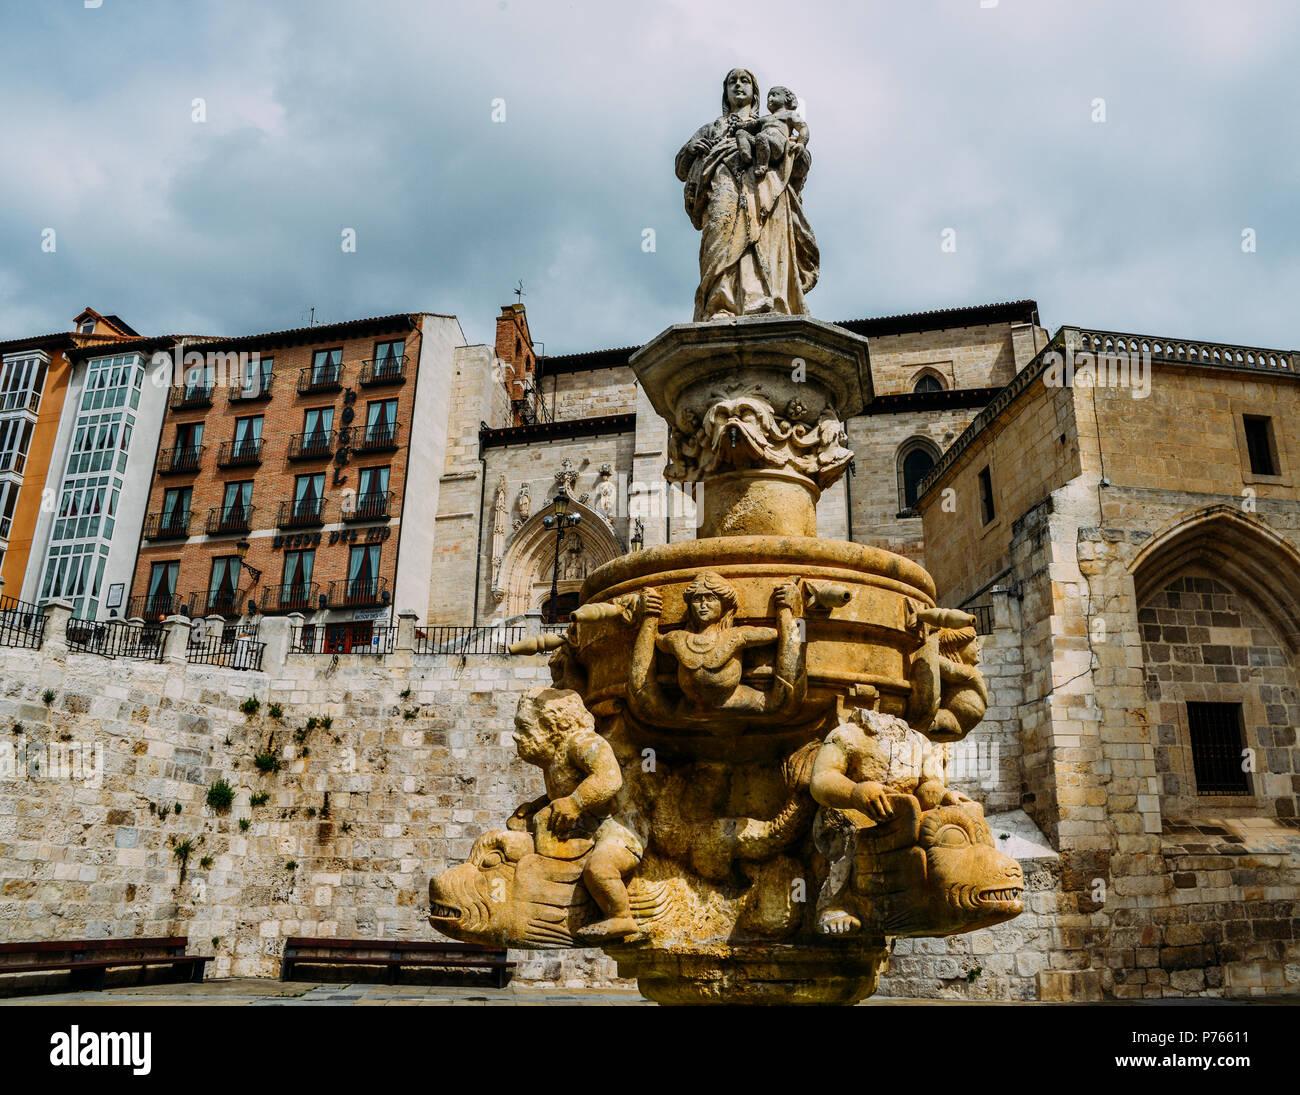 Cathedral of Burgos, Spain fountain - UNESCO World Heritage designation. - Stock Image